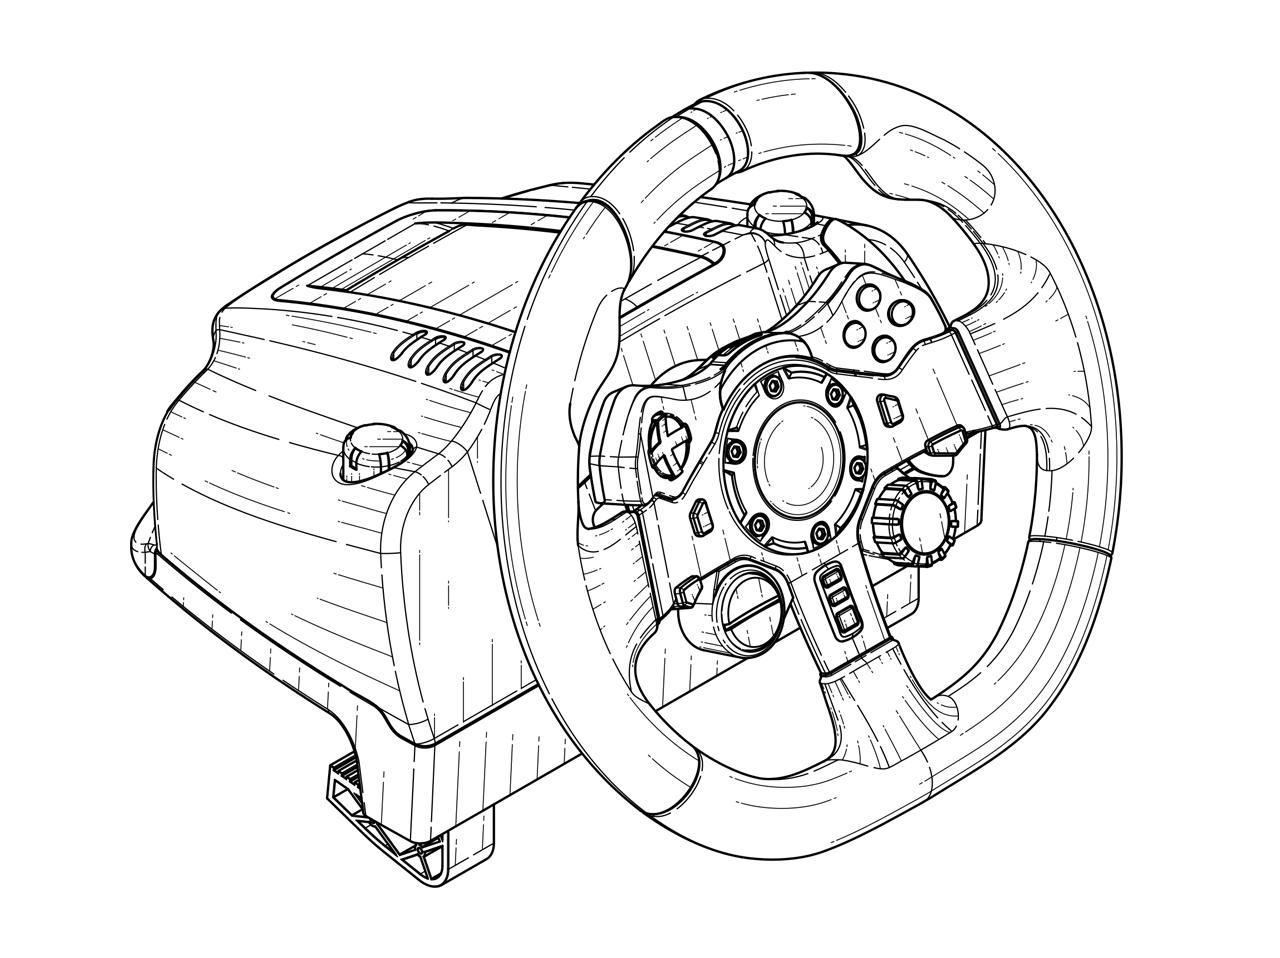 Illustration Sample 2